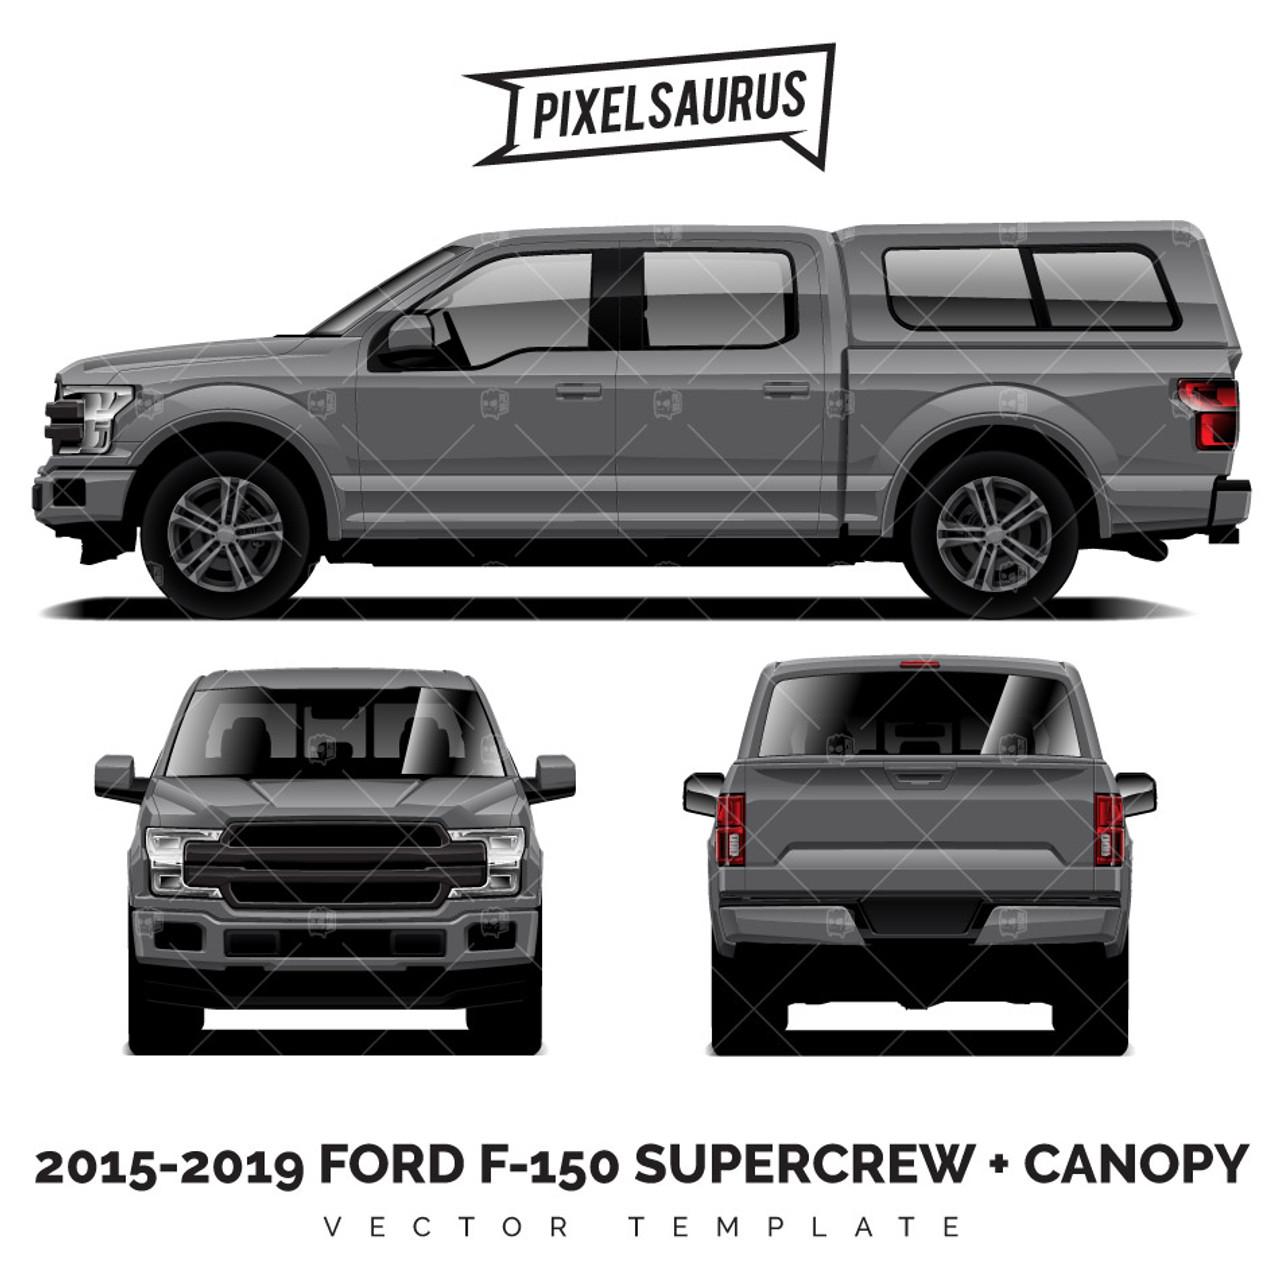 2015-2019 Ford F-150 Crew Cab